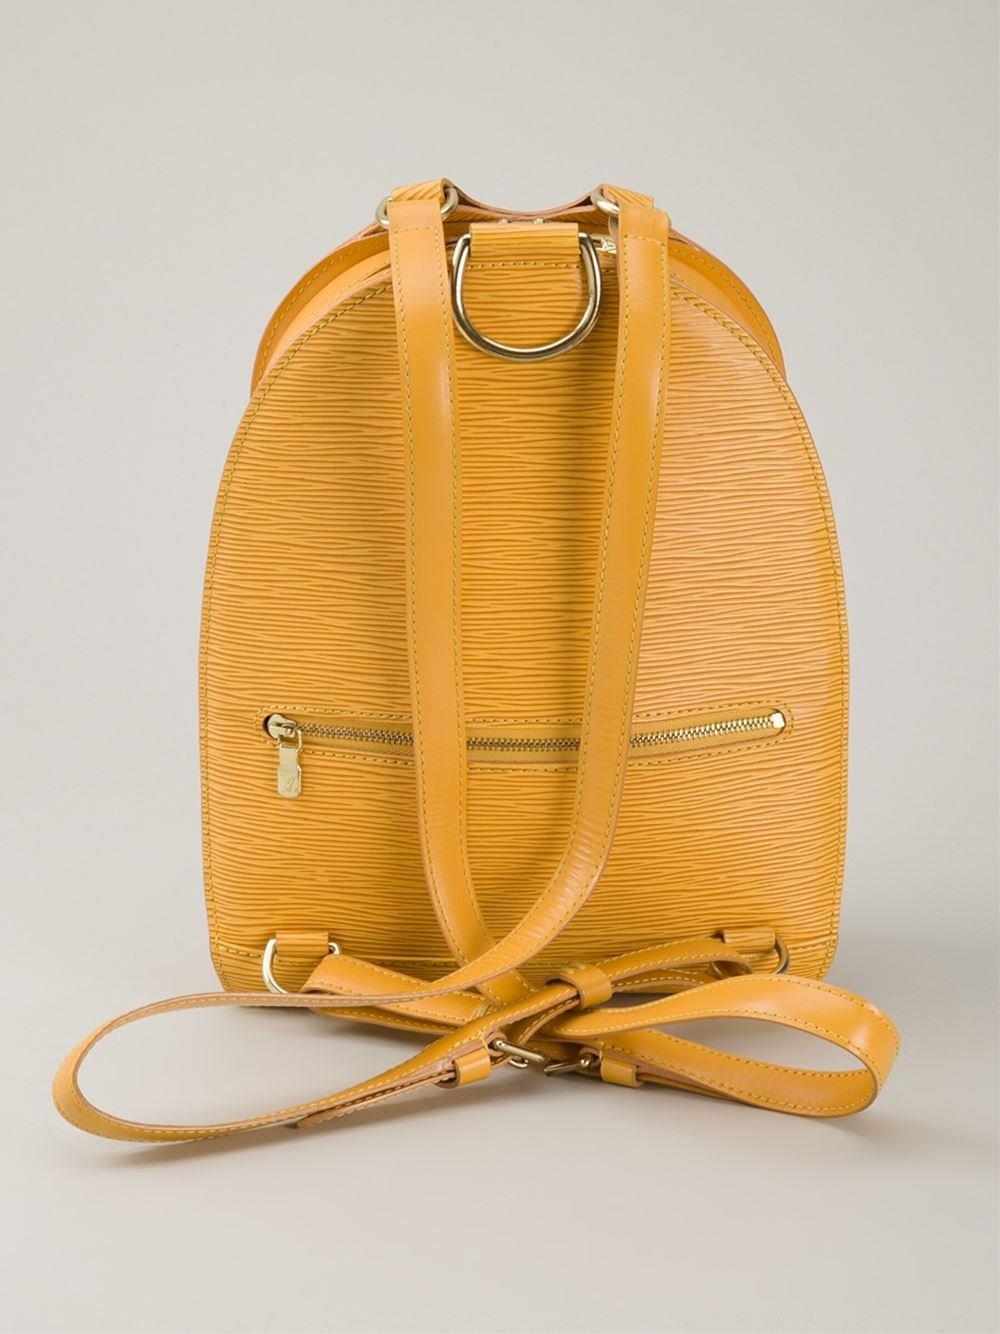 acf86fd78ef9 Louis Vuitton Yellow Epi Gobelins Backpack